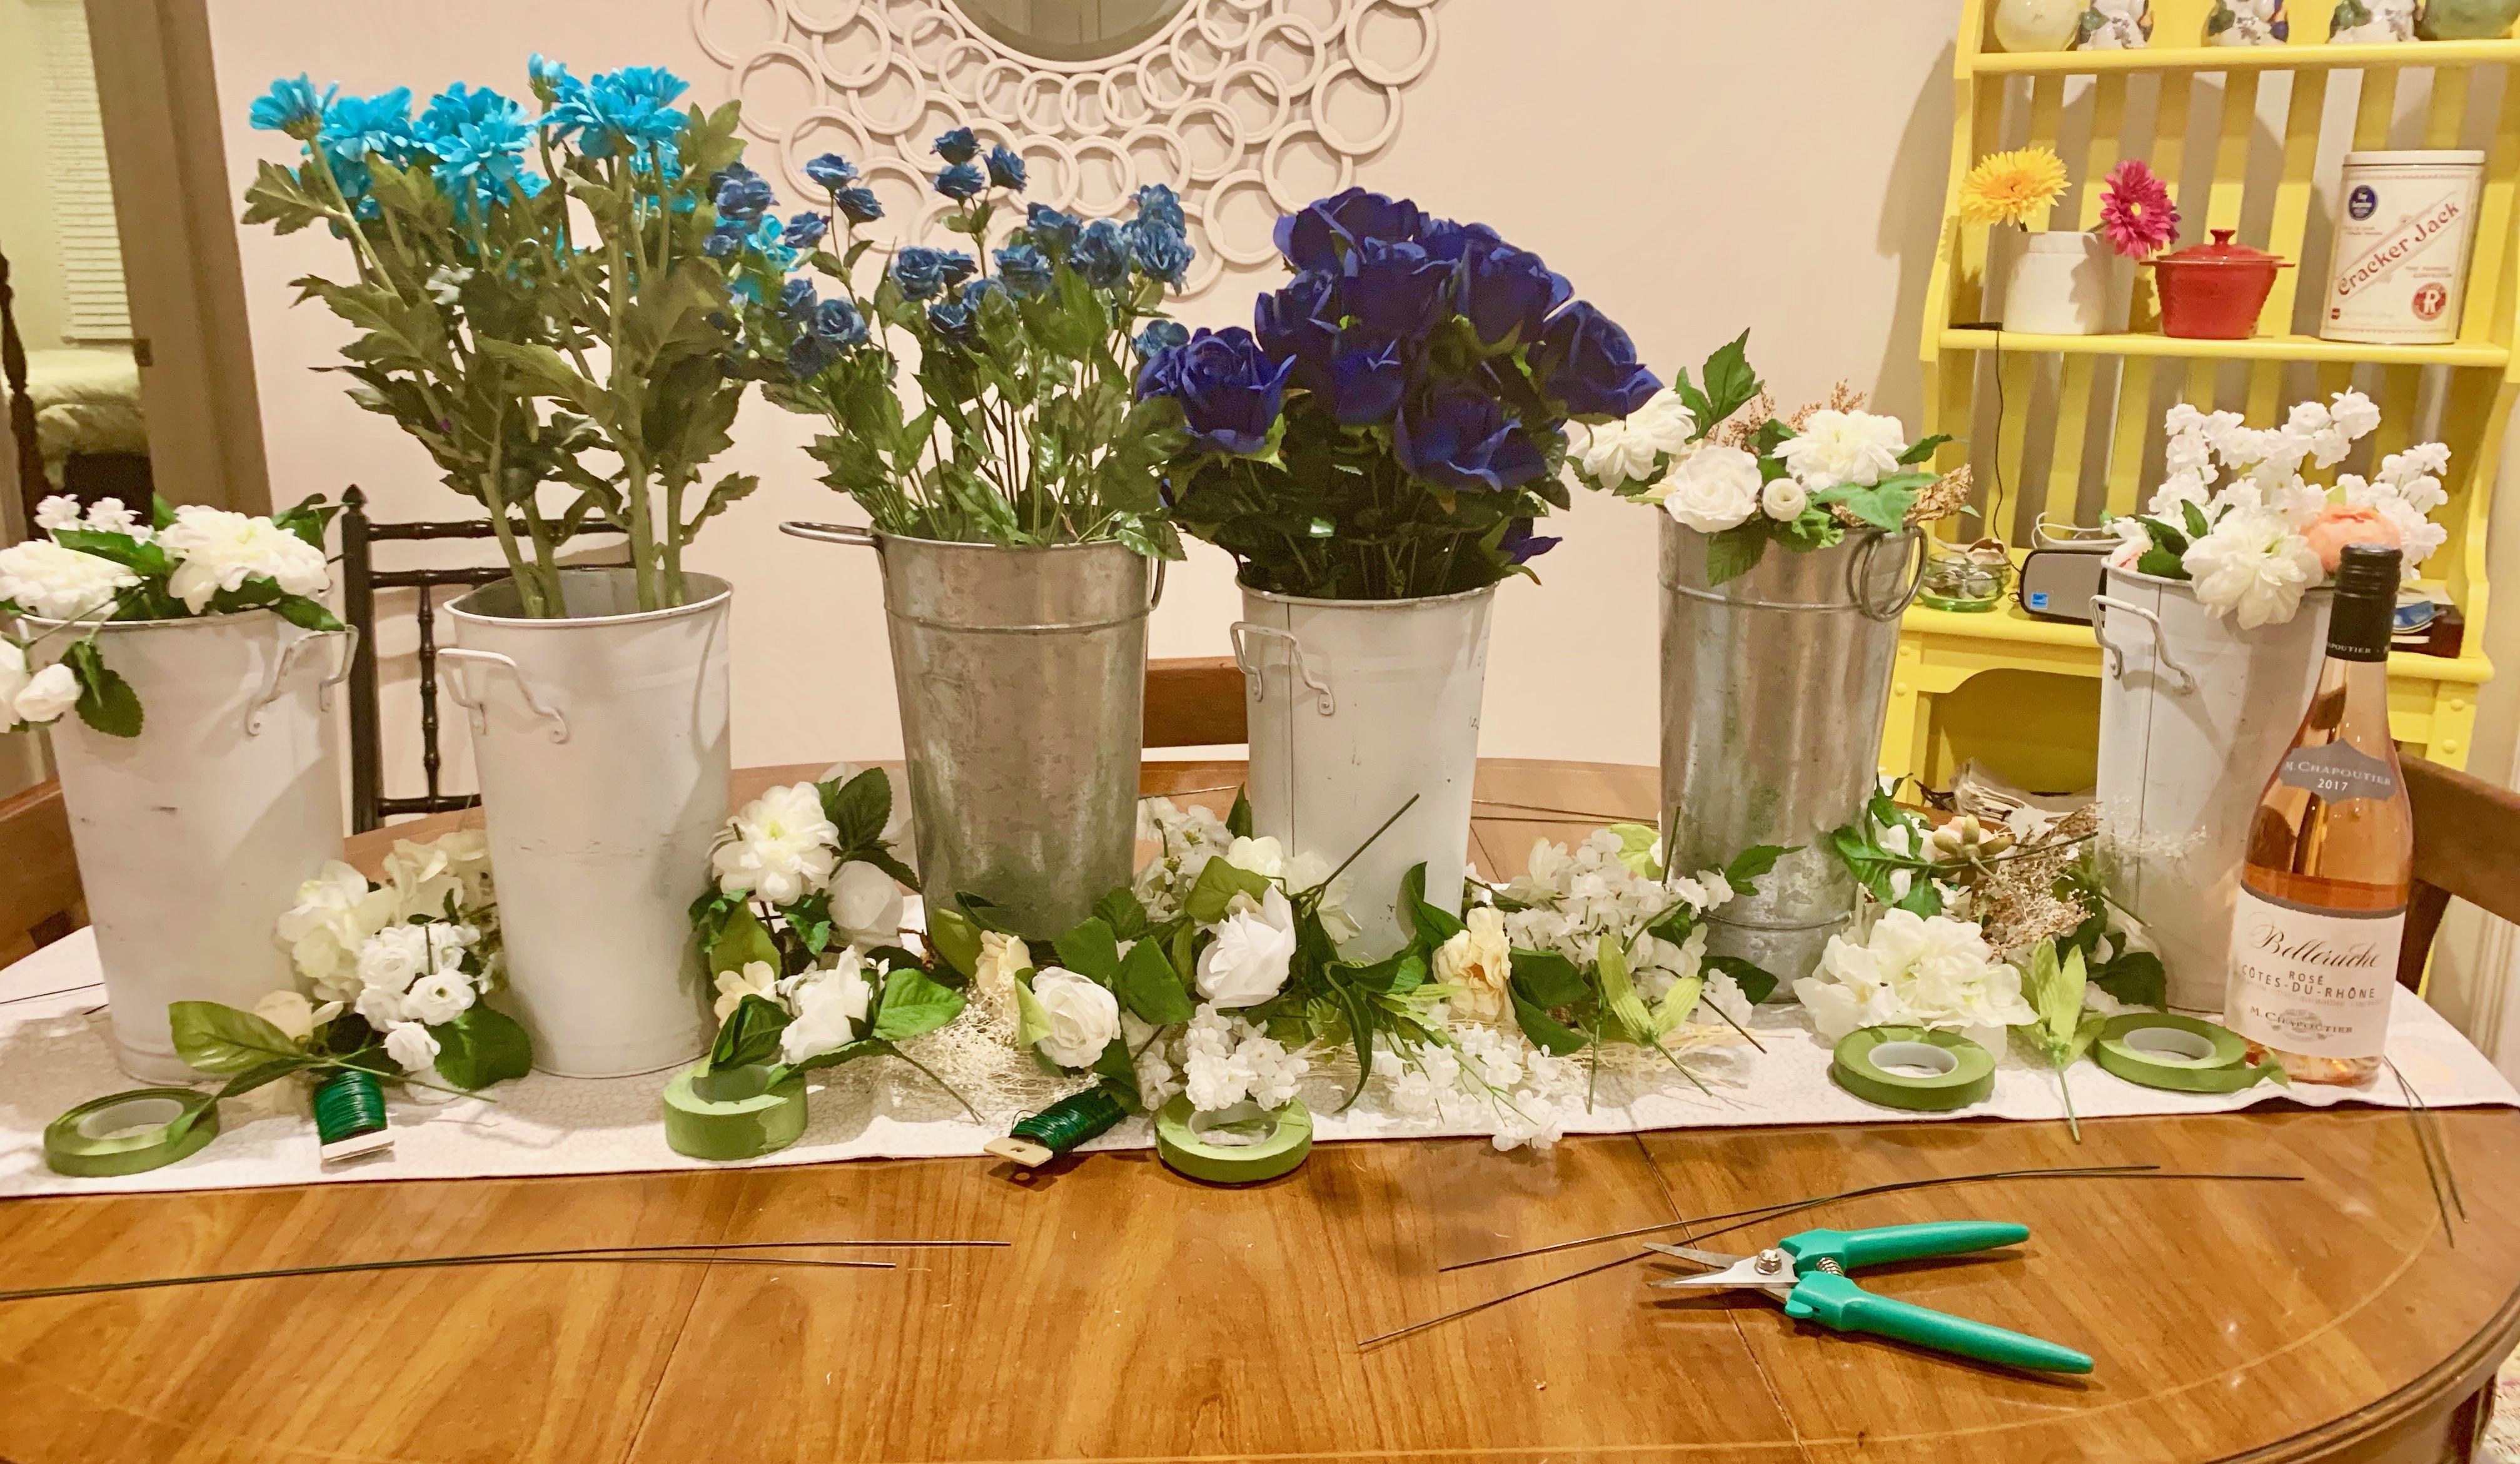 classy bachelorette party gift ideas